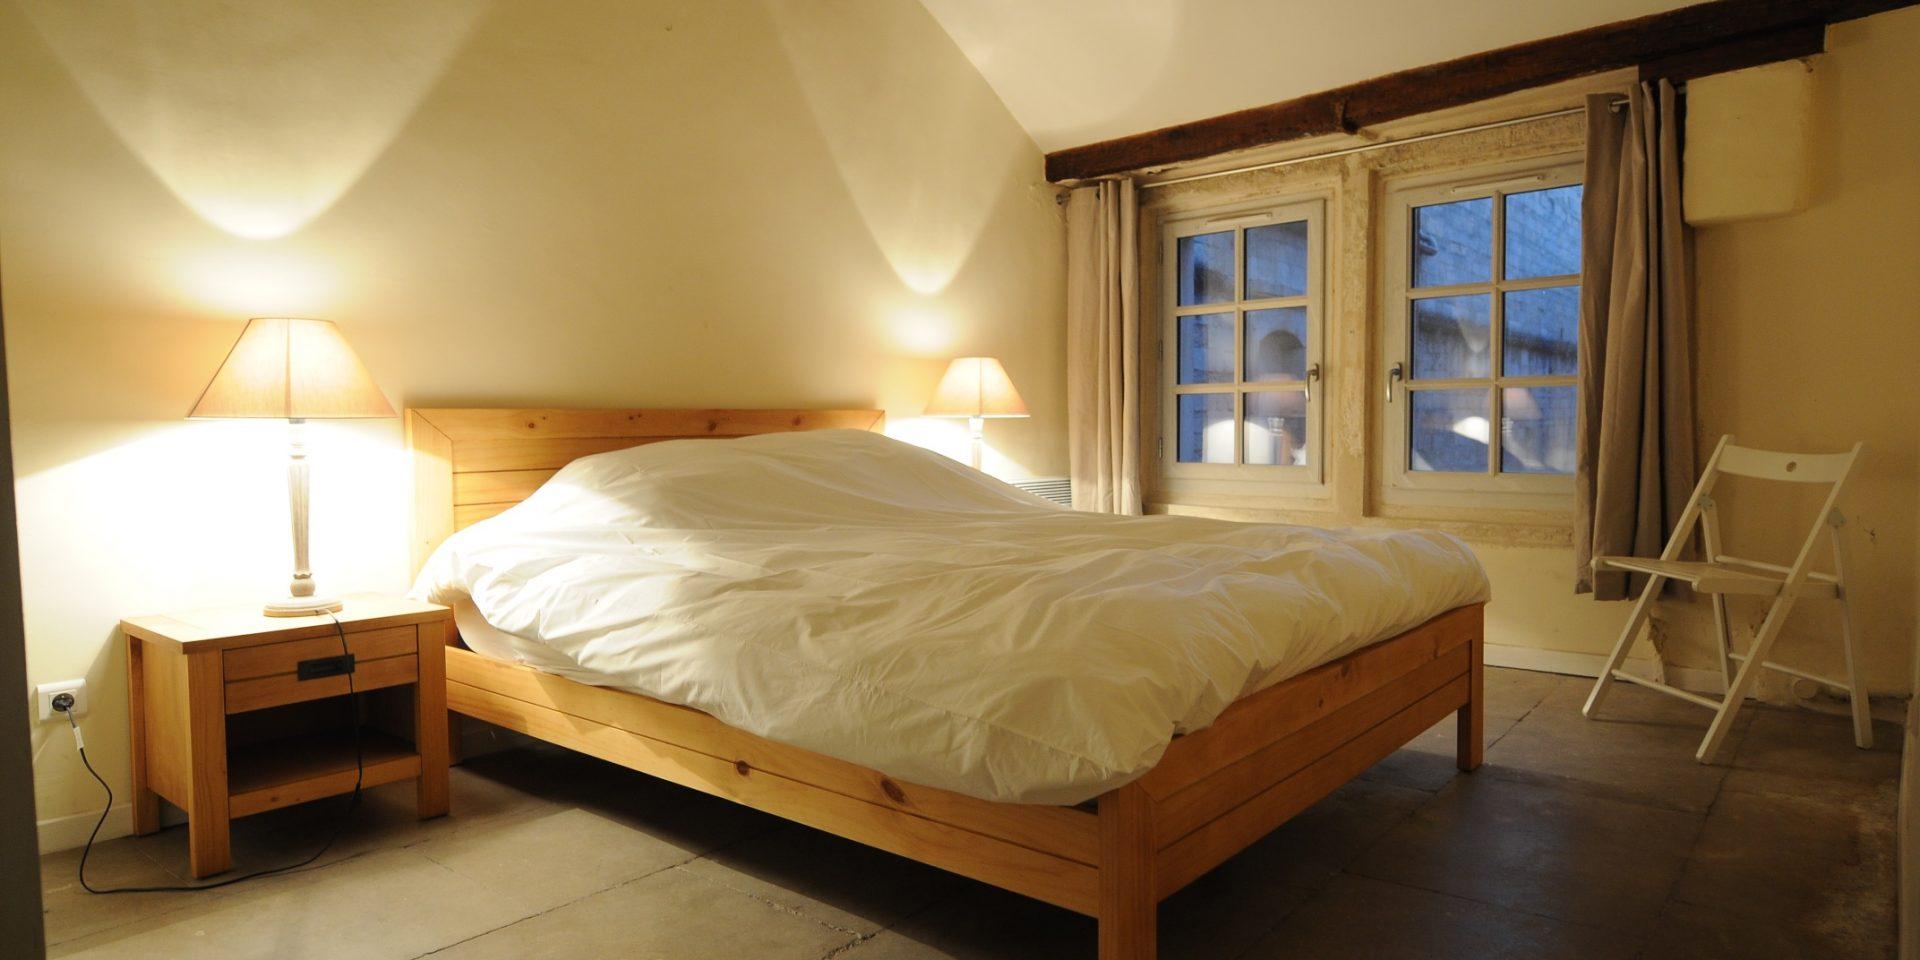 Bedroom on the street